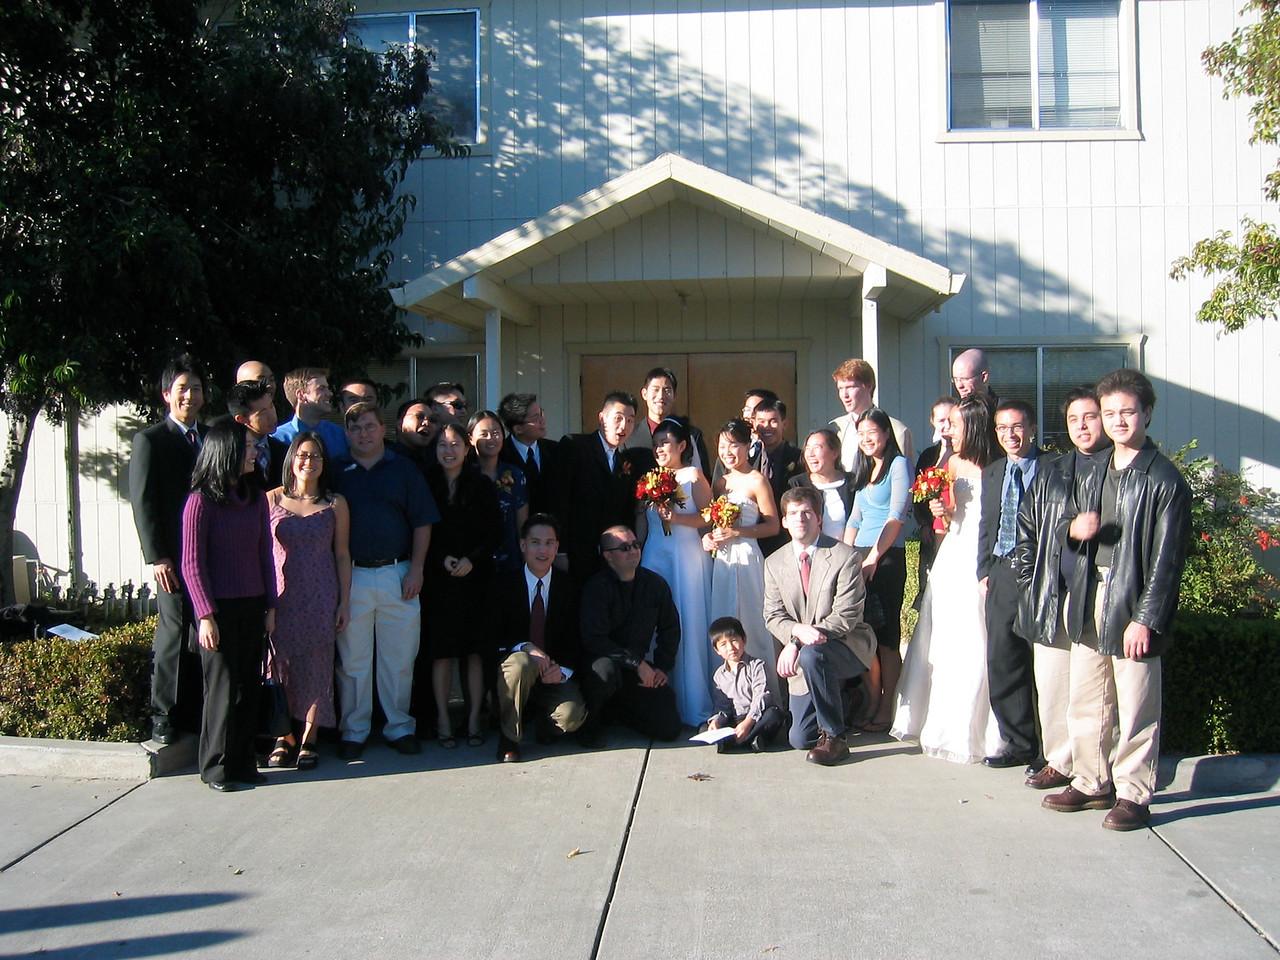 c2 - Cal group pic